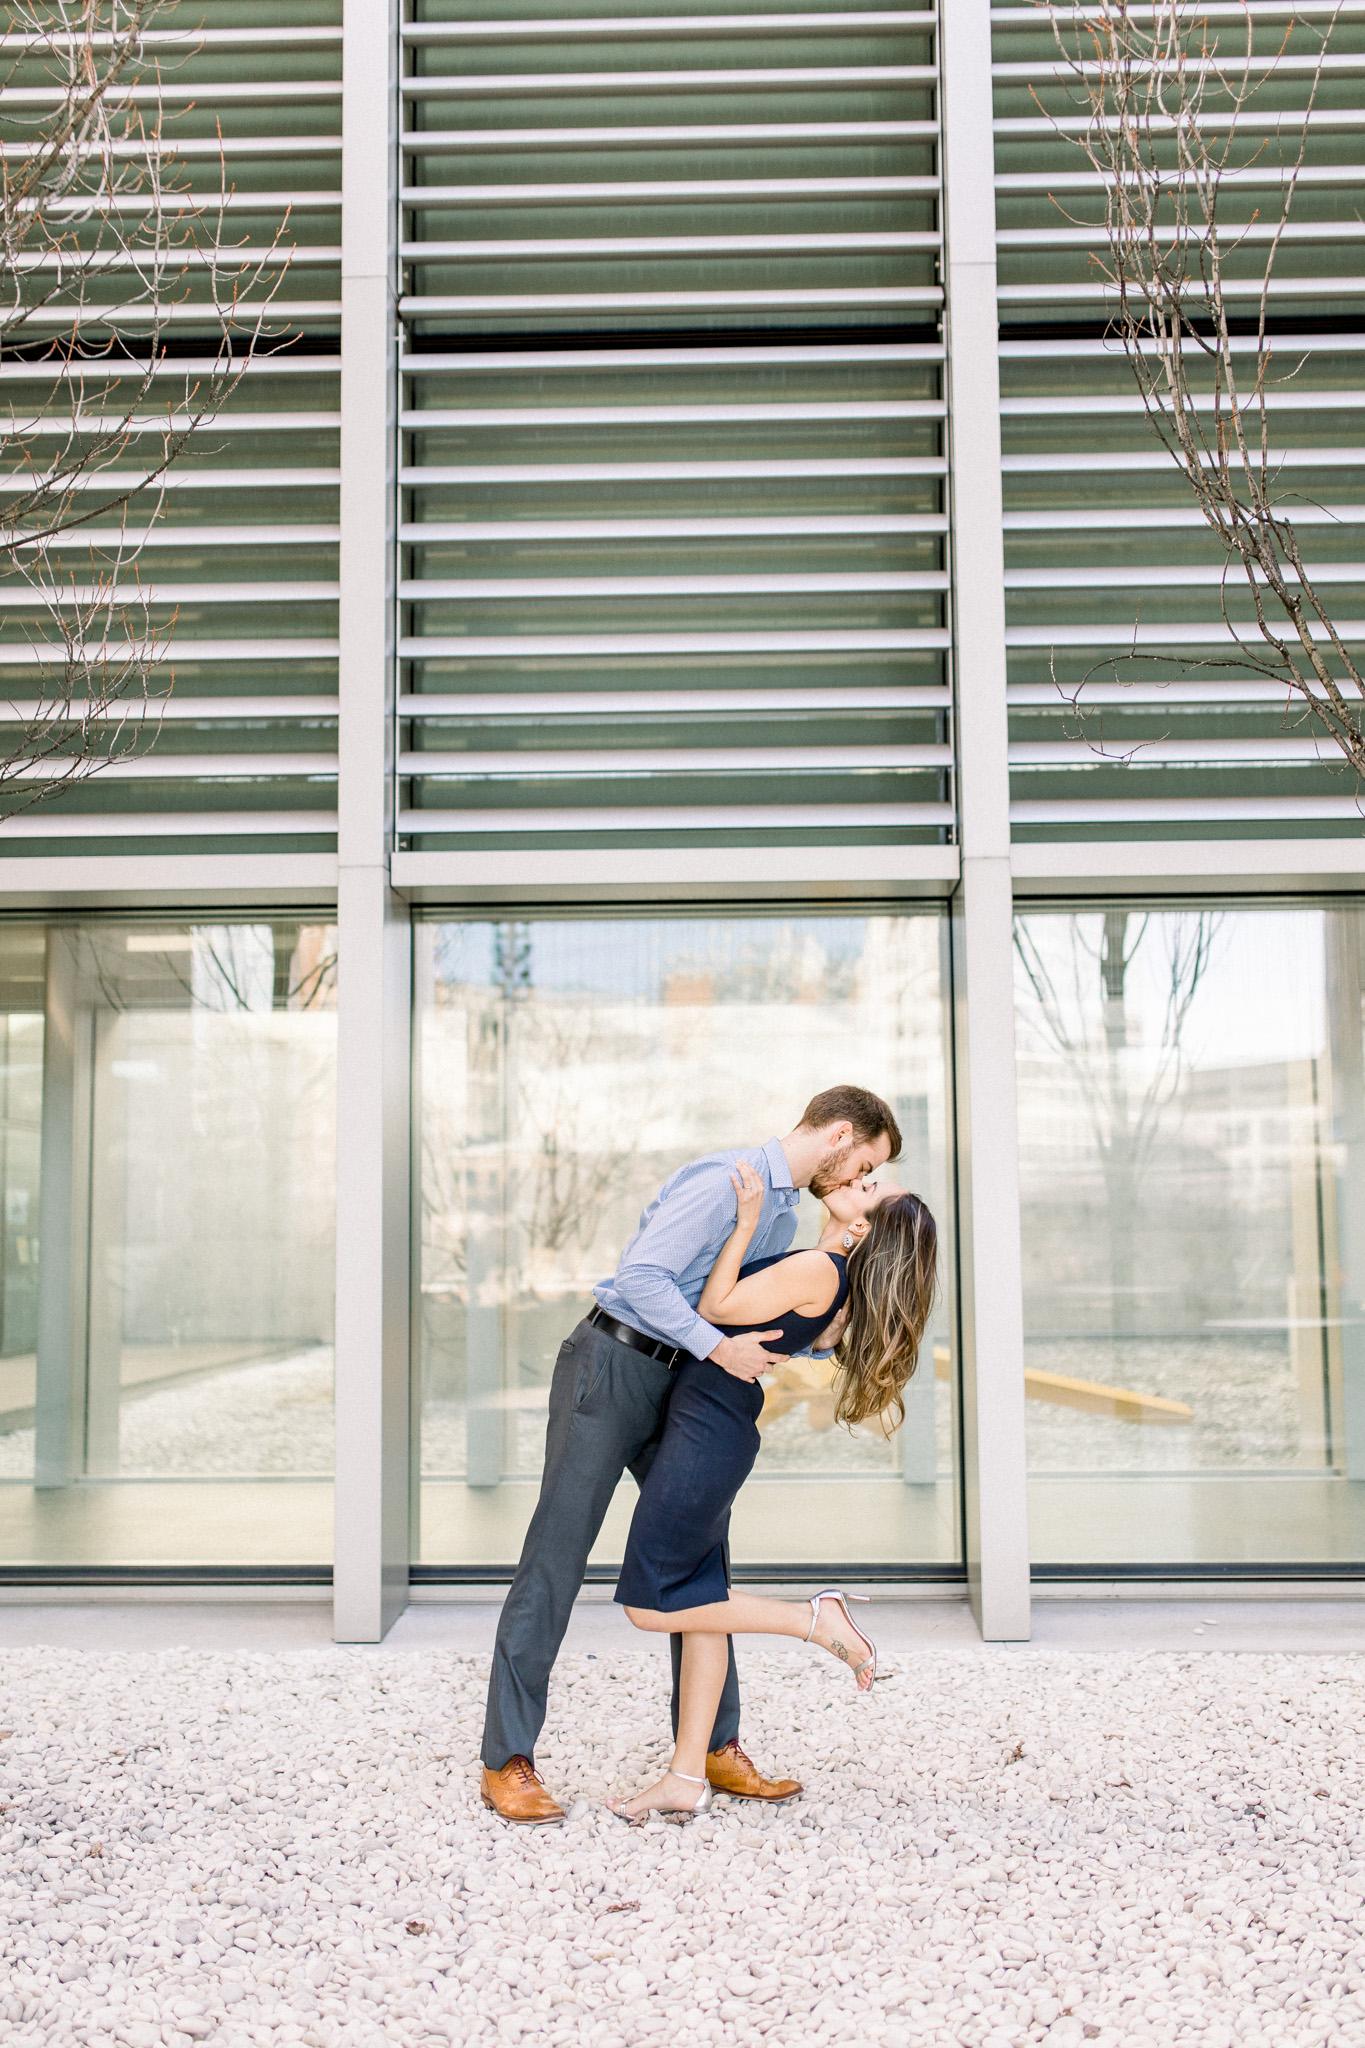 Romantic Engagement Session in the City | Grand Rapids Wedding Photographer | Elegant Engagement | Laurenda Marie Photography